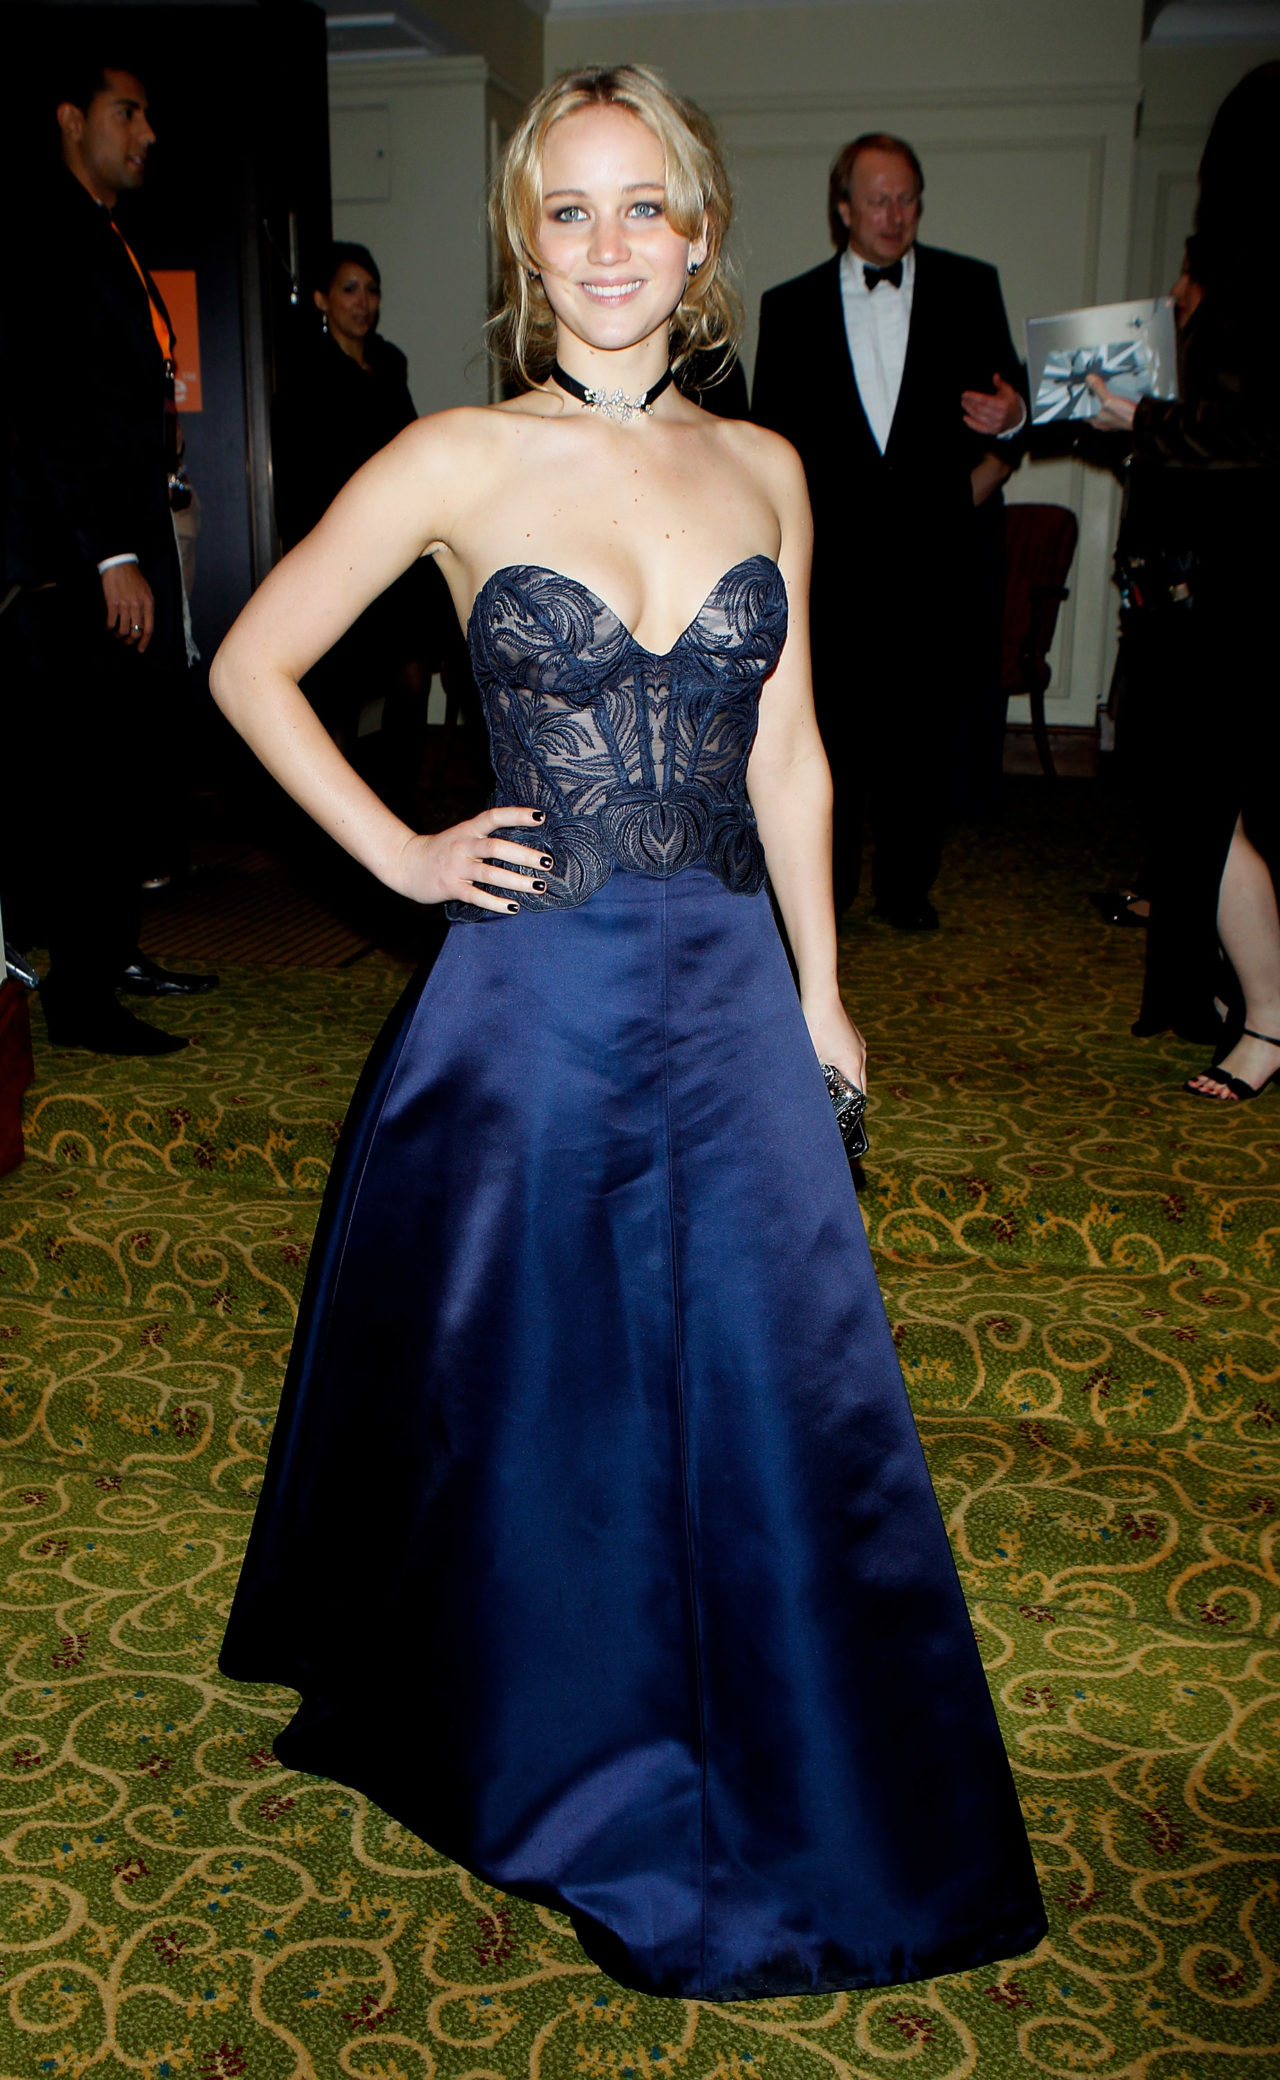 Jennifer Lawrence 17 évesen